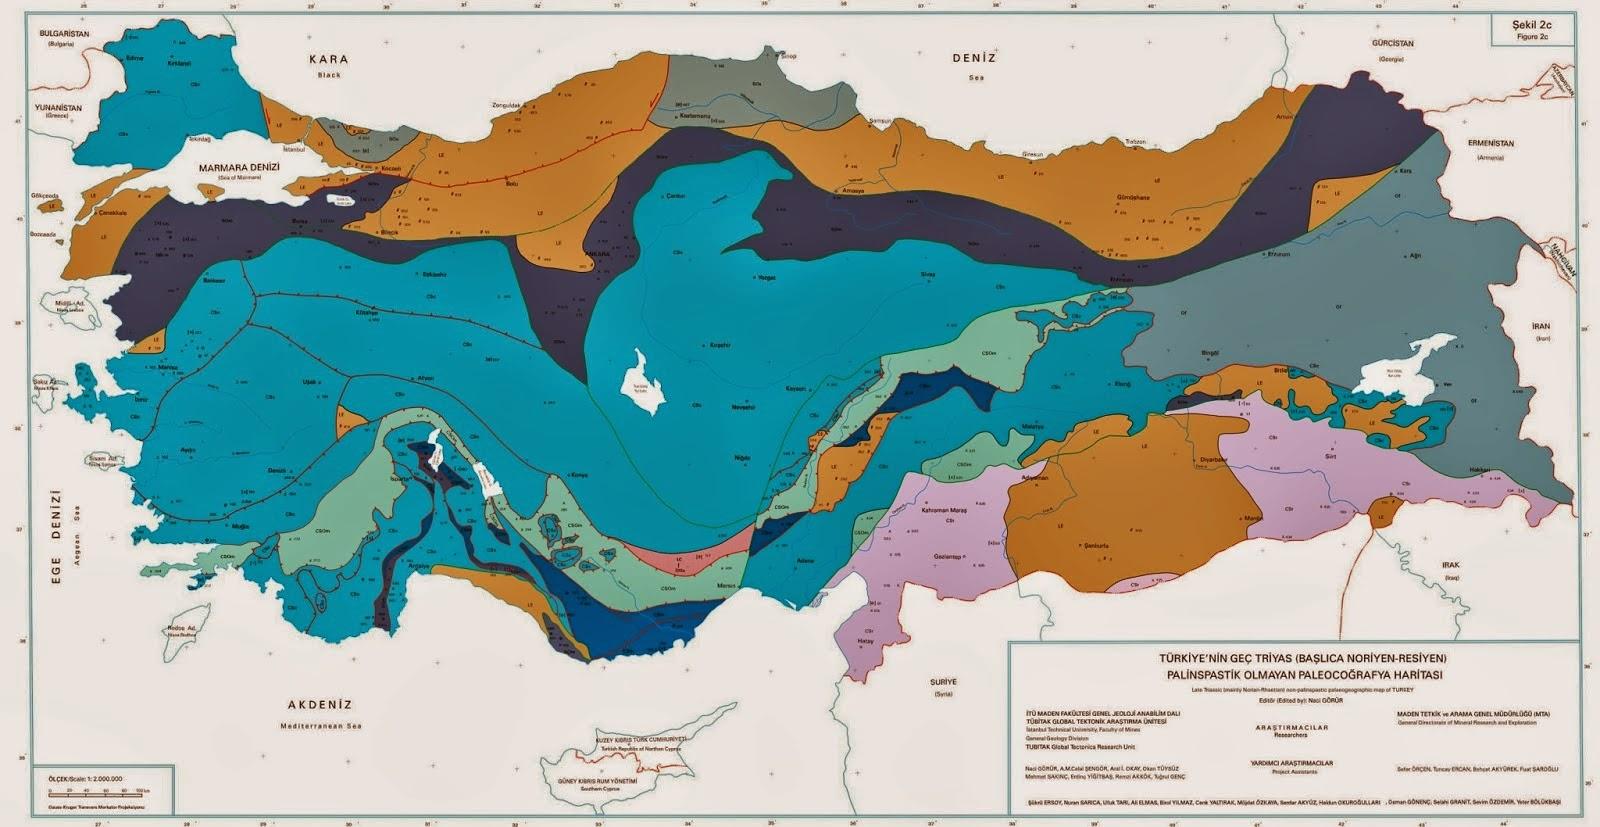 T�rkiye Paleoco�rafya Haritas�